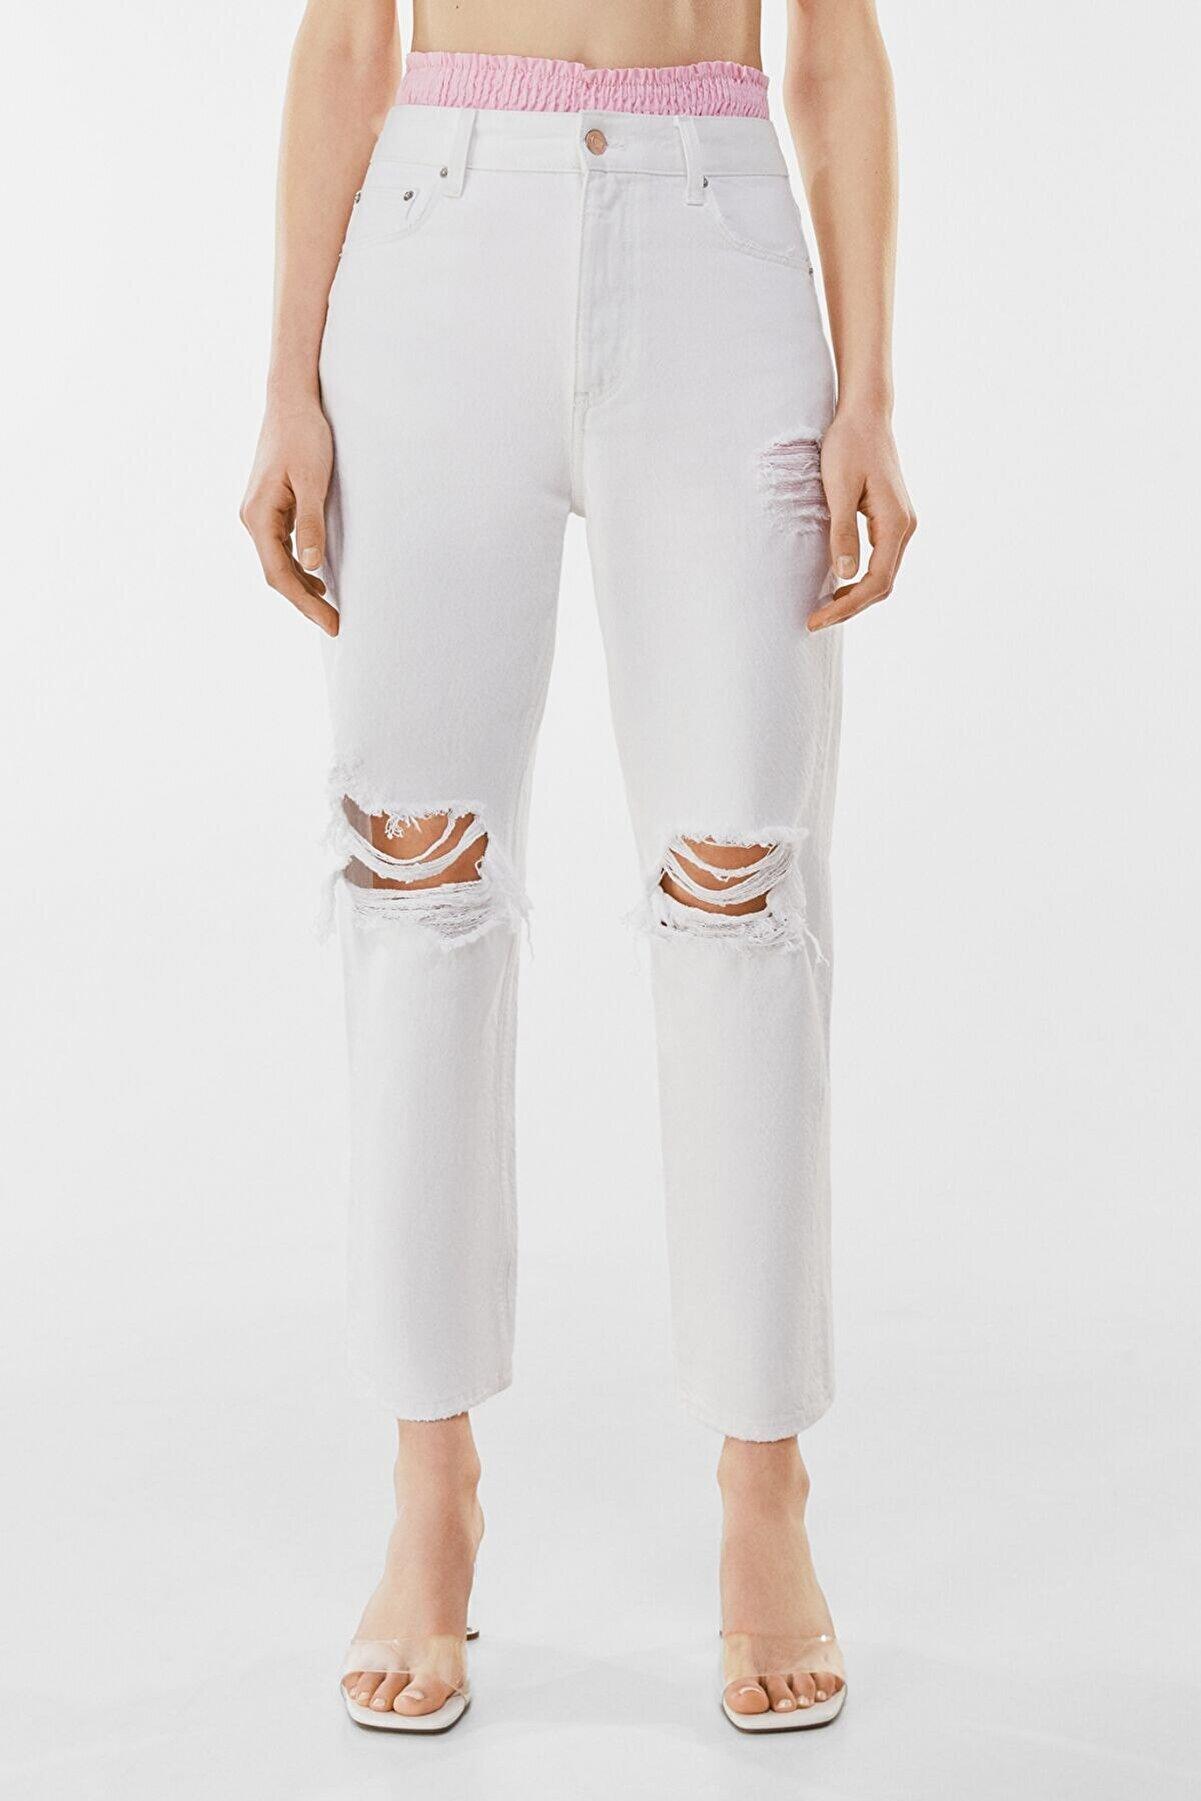 Bershka Kadın Beyaz Straight Fit Crop Jean 00225179